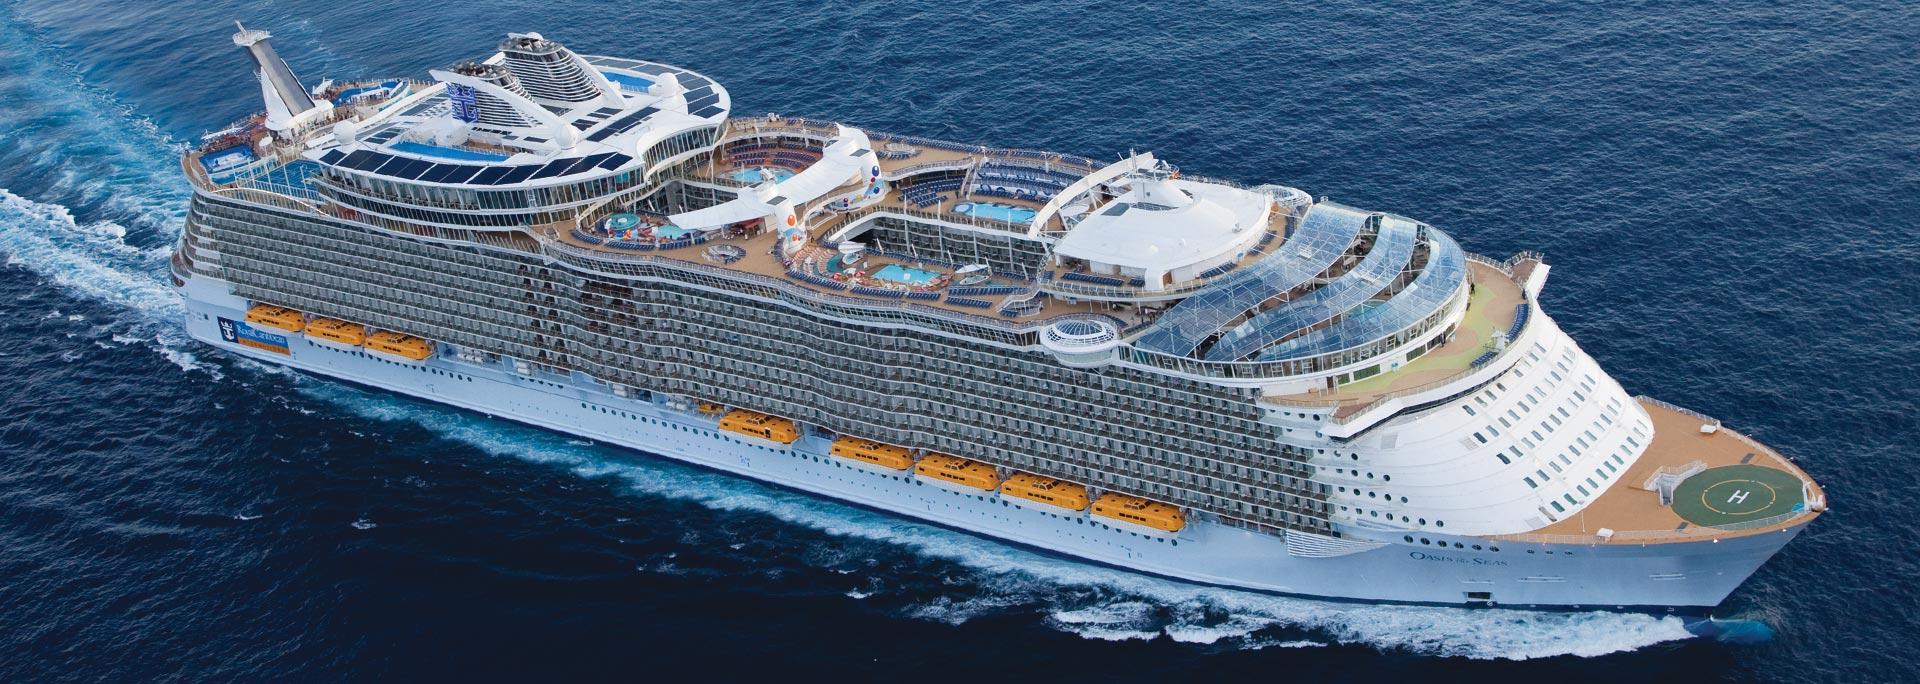 Oasis of the Seas. Foto: Royal Caribbean